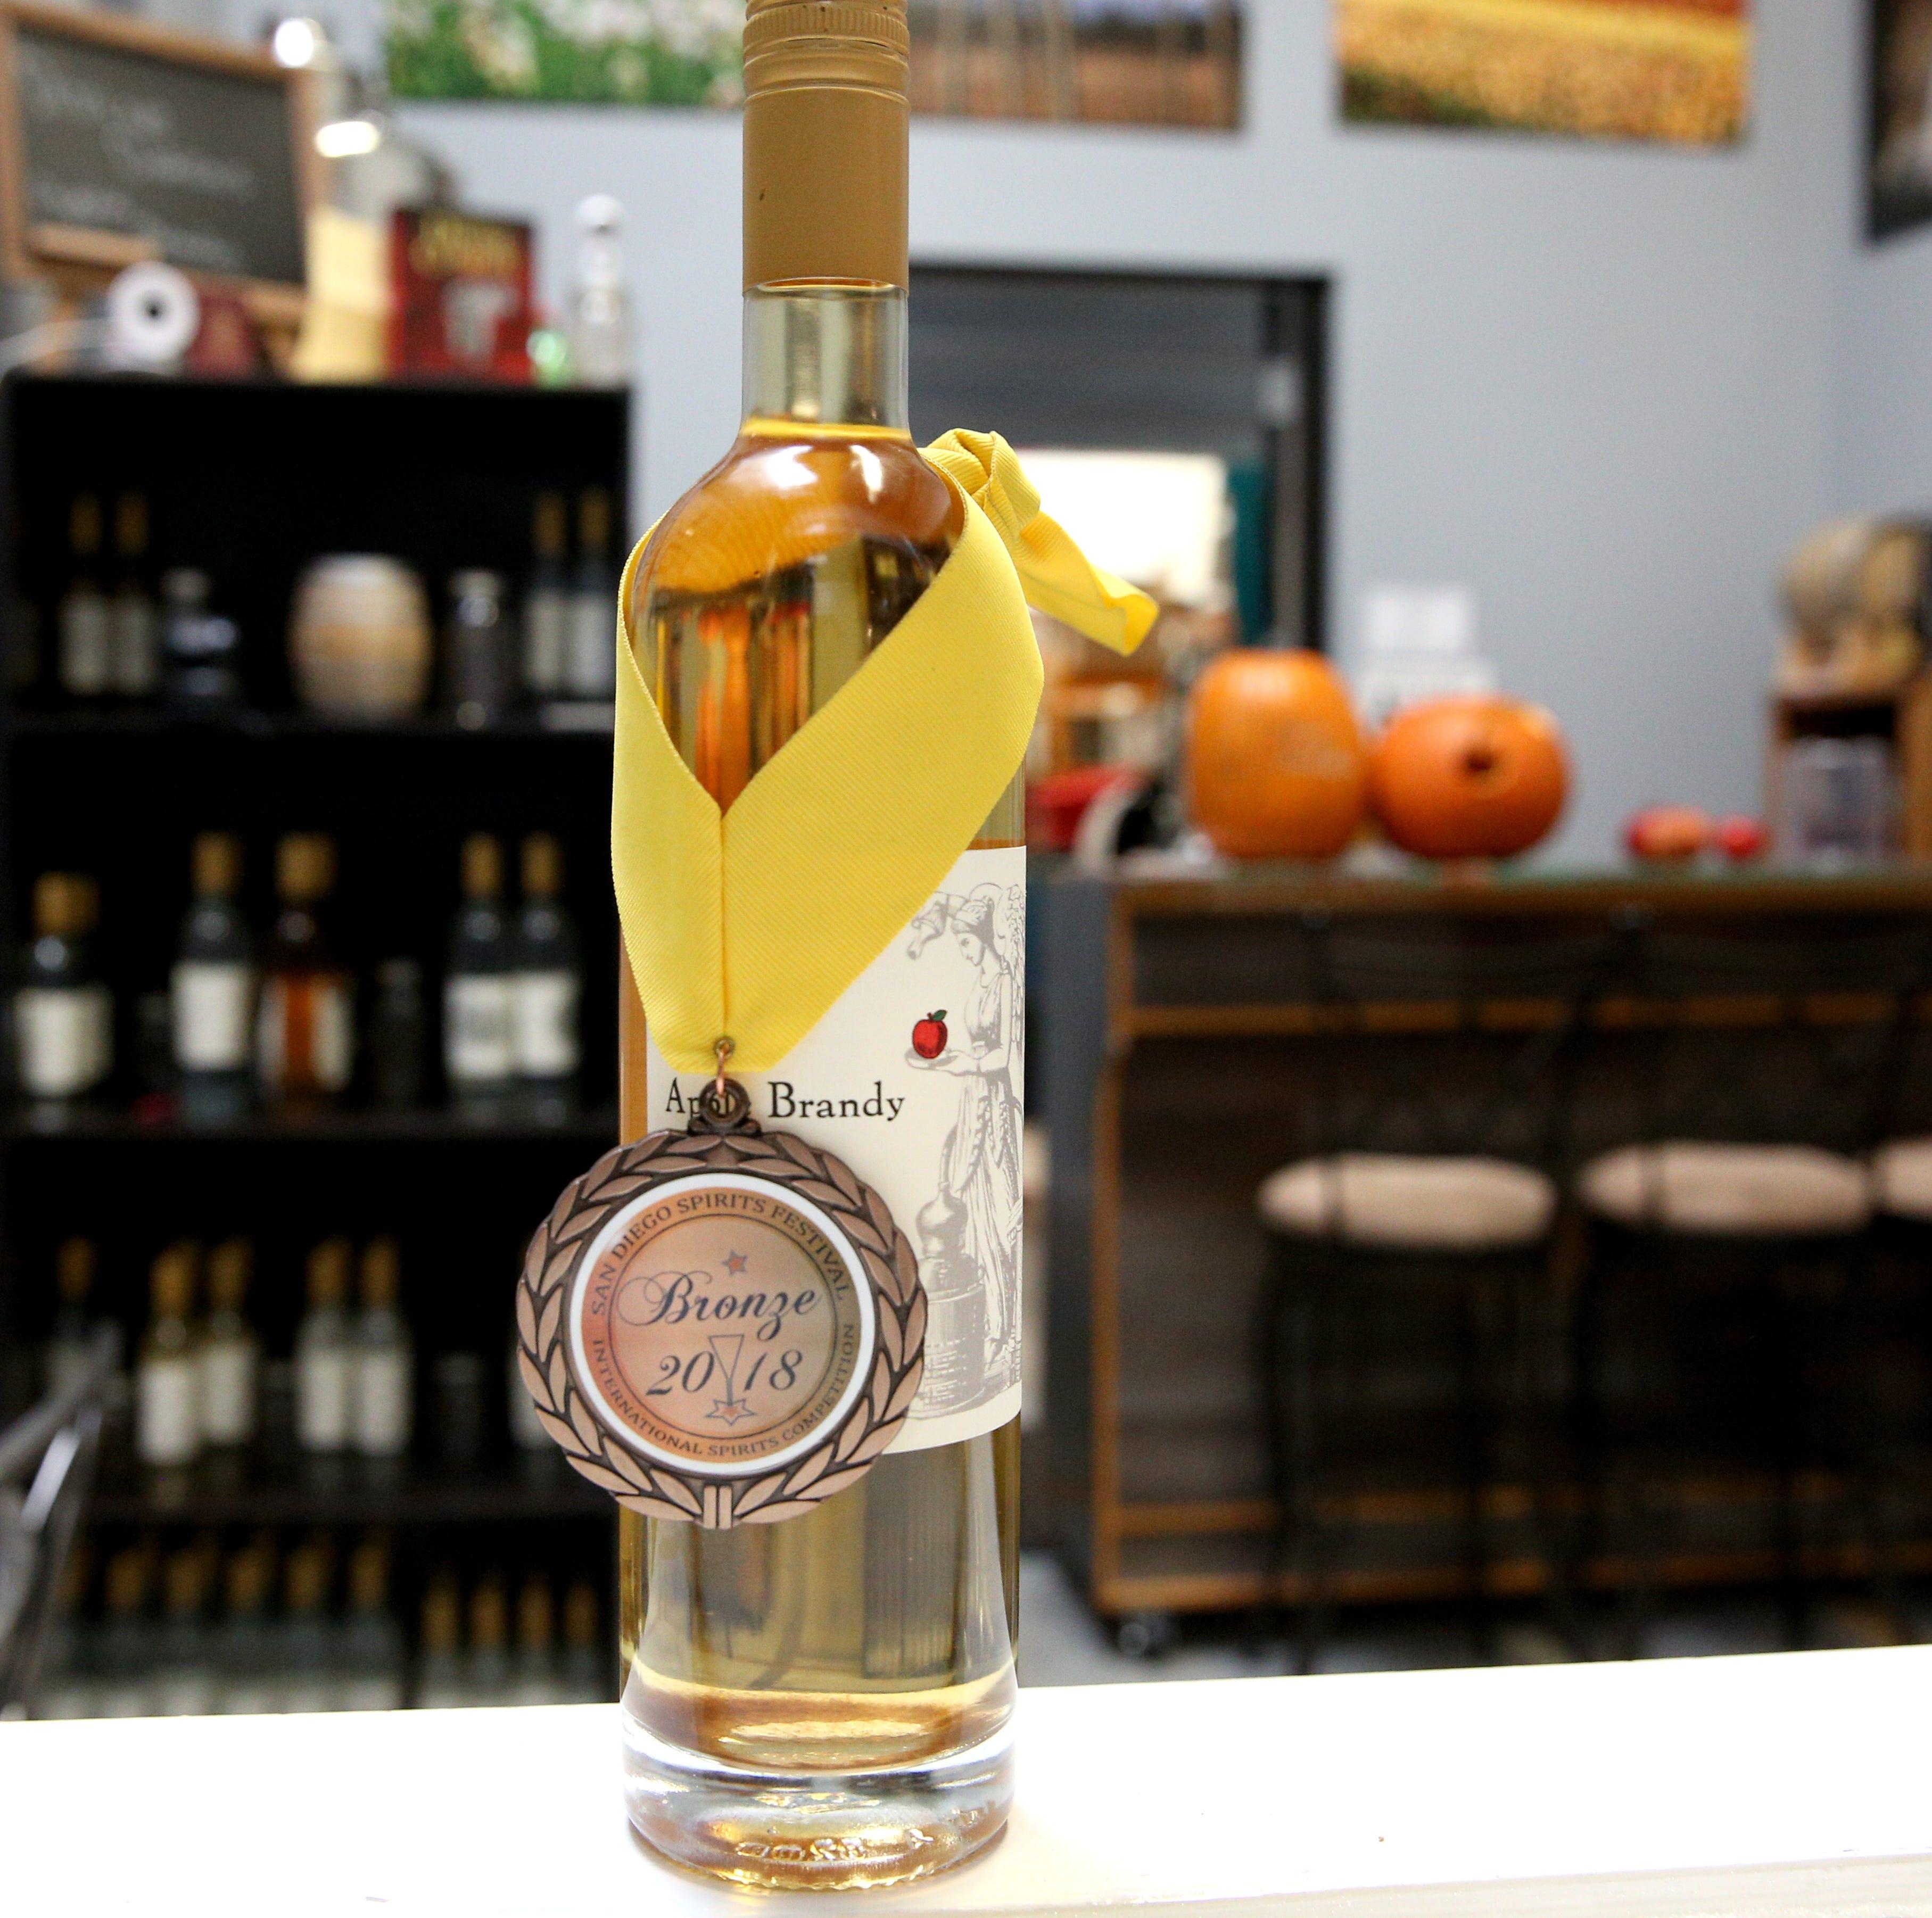 Salem's first brandy distillery uses Willamette Valley fruit